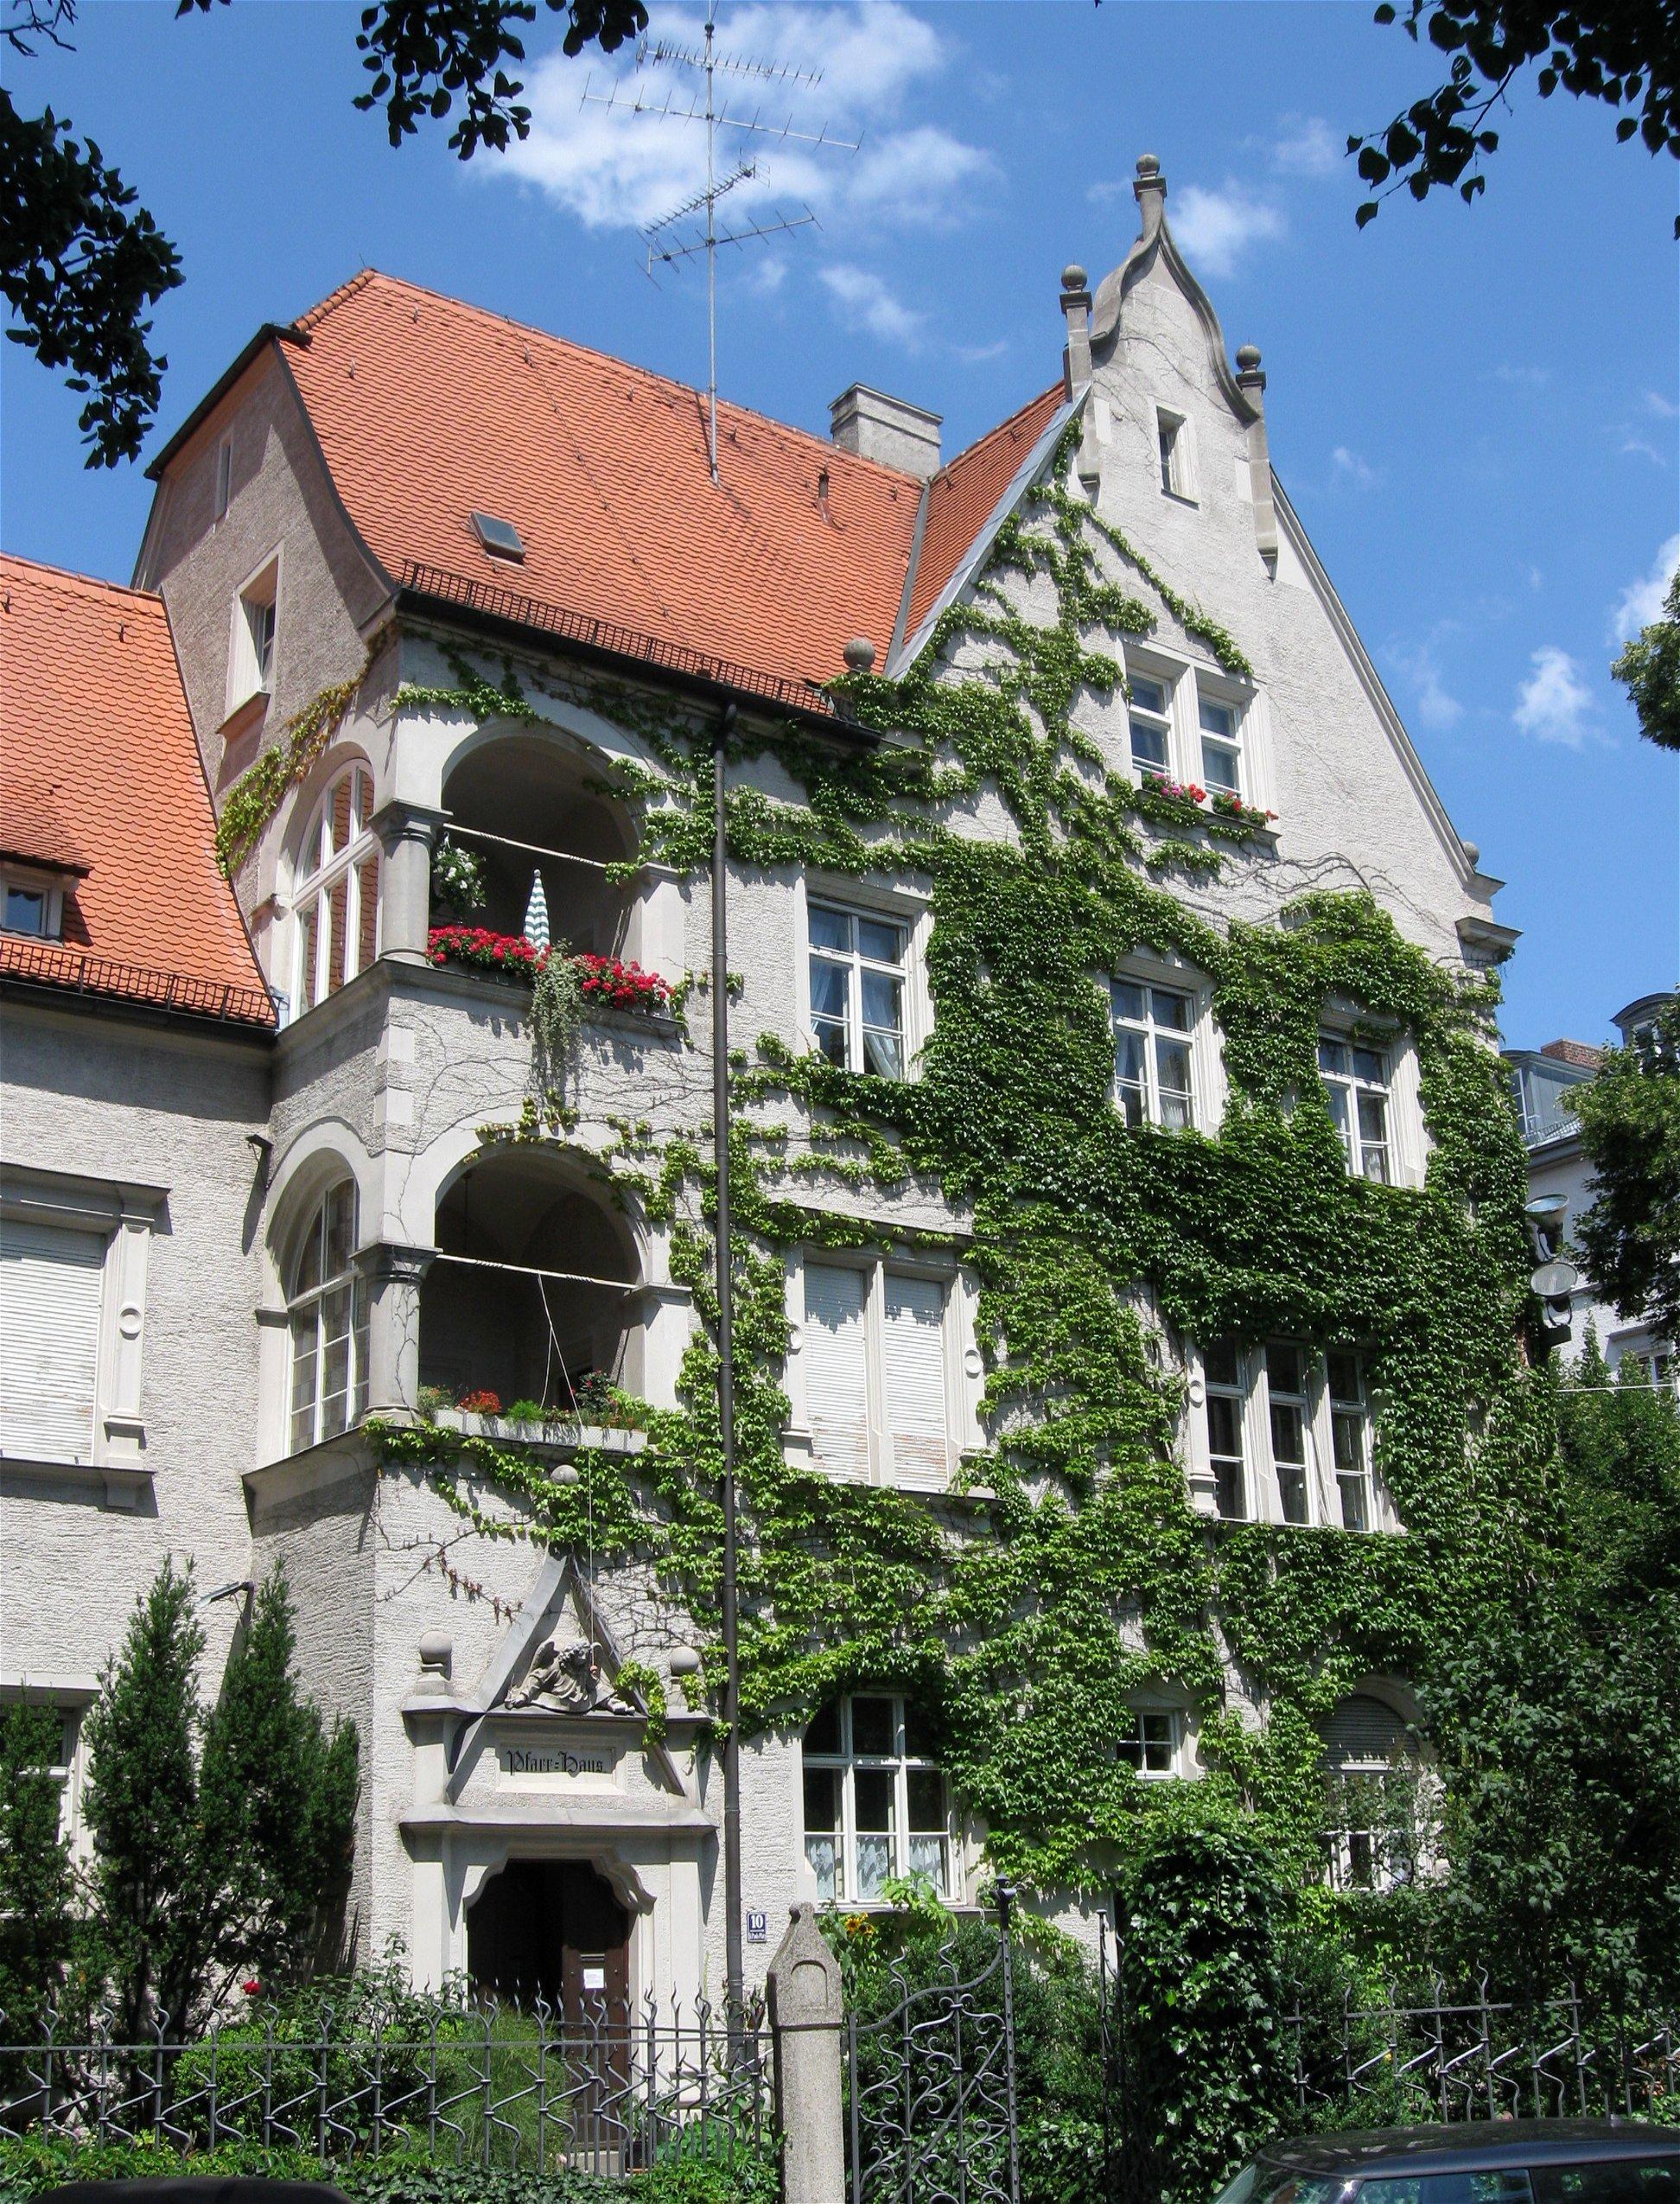 St Platz München file st pauls platz 10 muenchen 1 jpg wikimedia commons